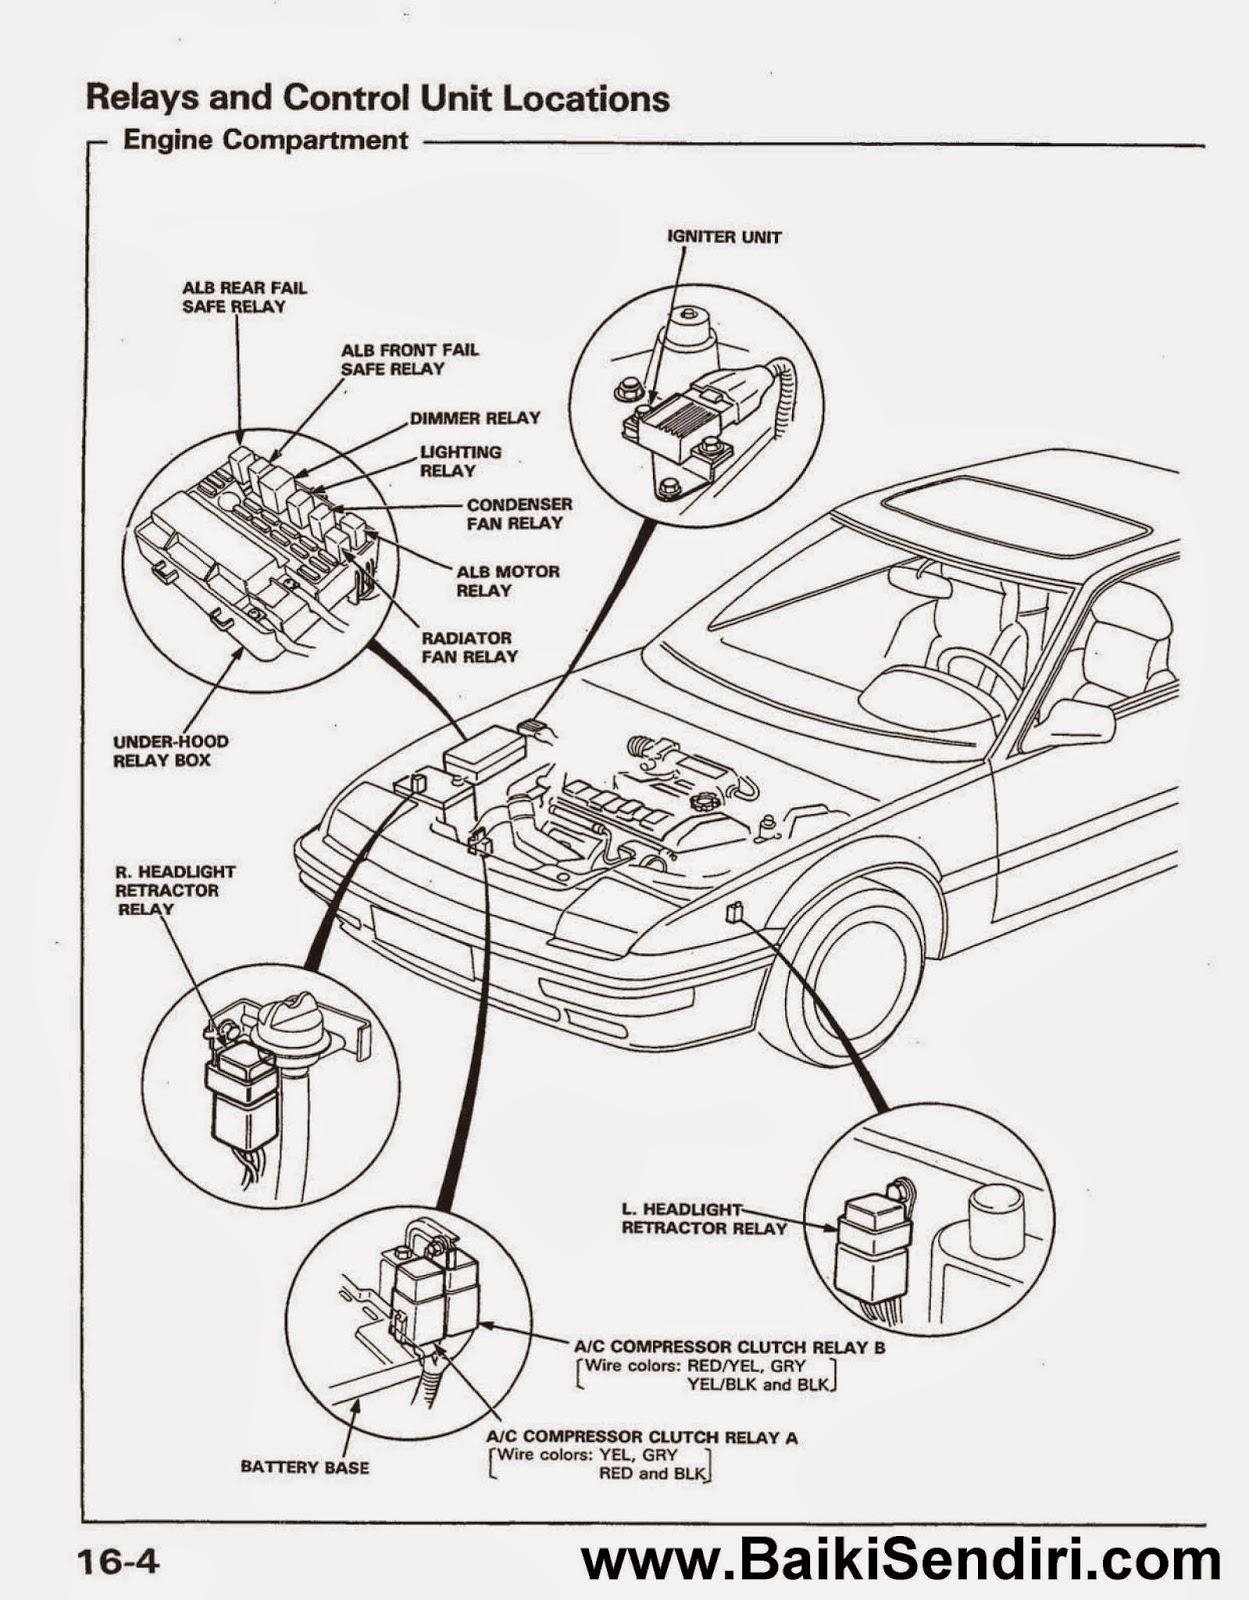 2001 honda prelude wiring diagram vw golf gti mk1 fuse box library